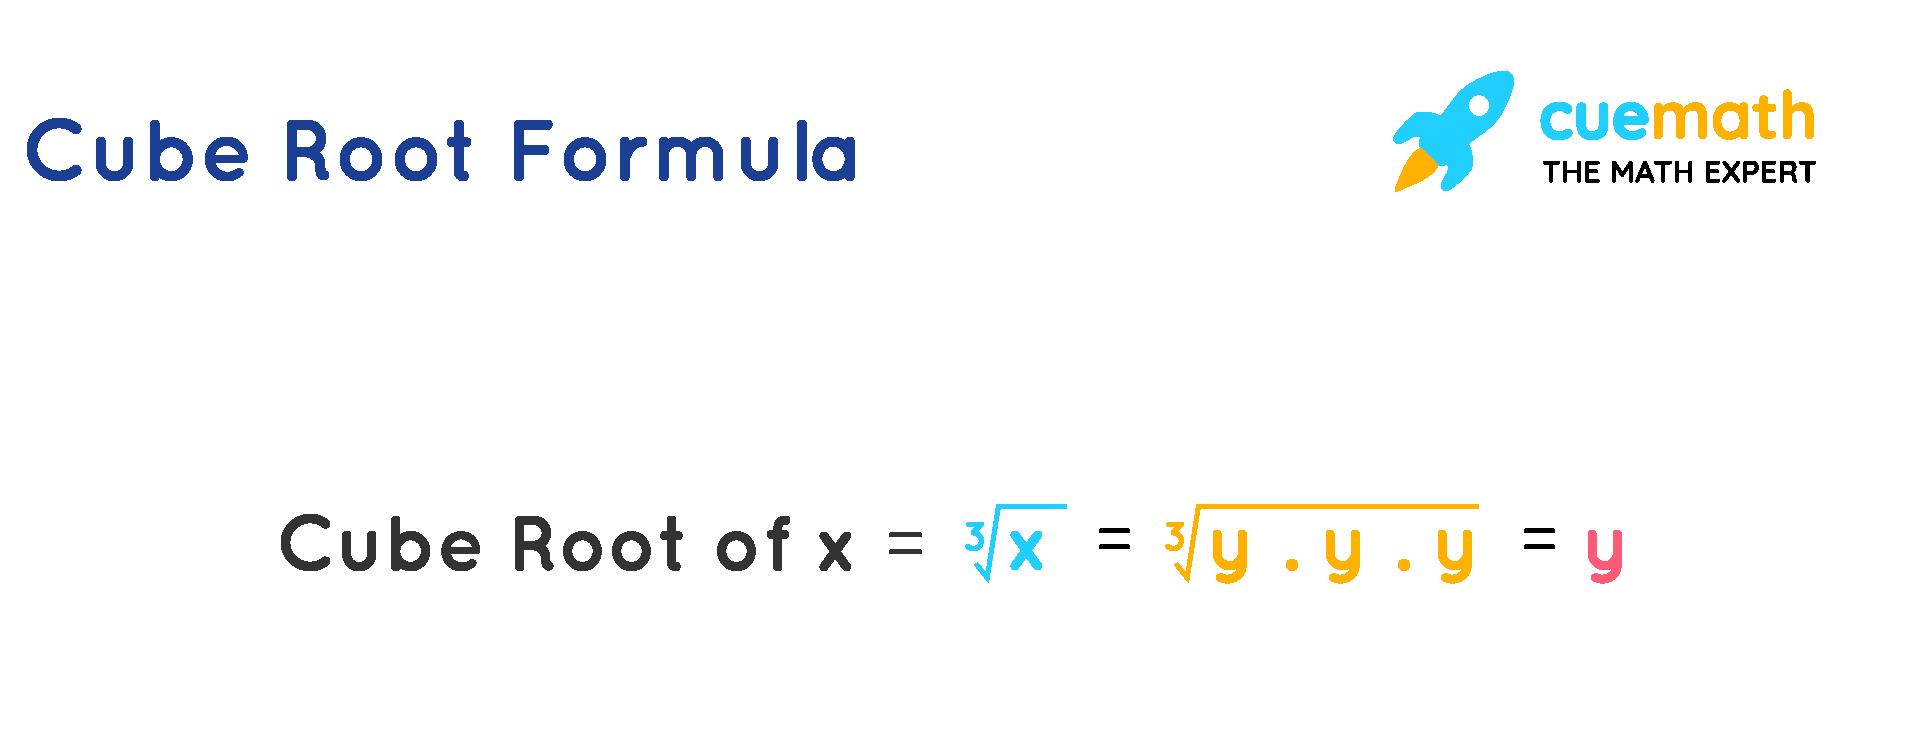 Cube Root Formula